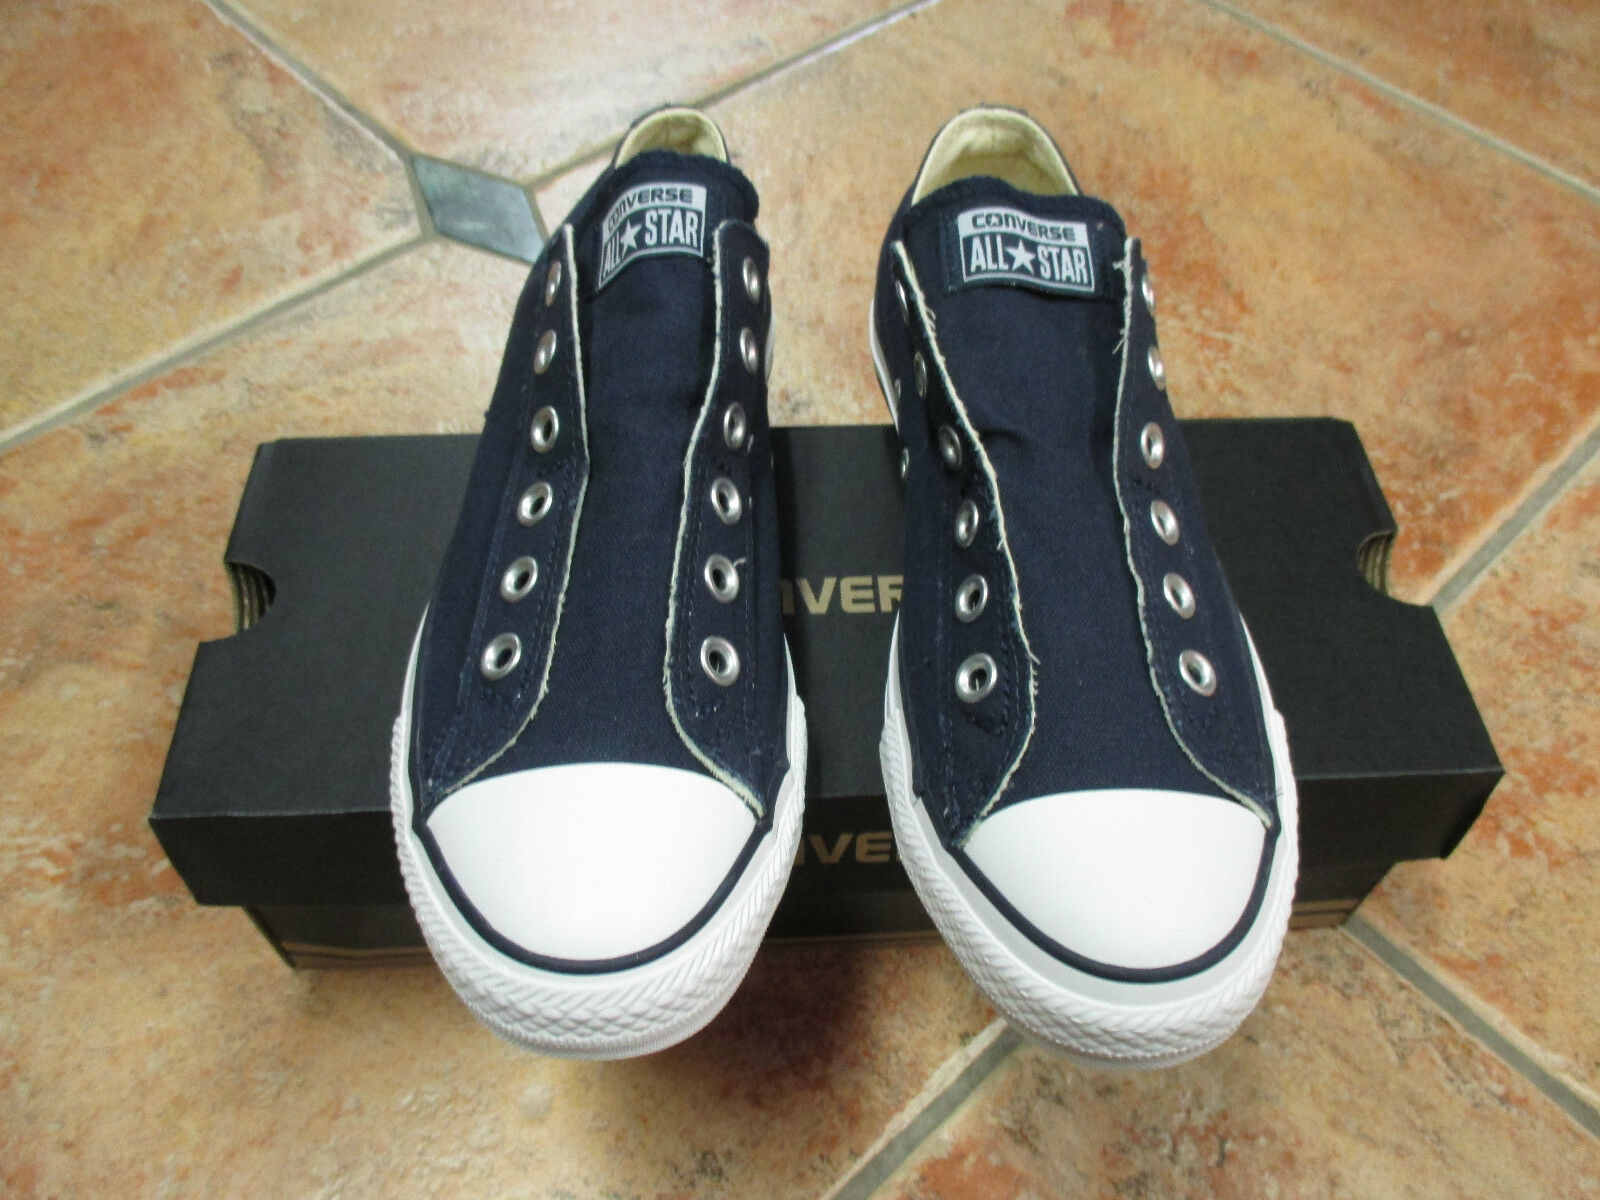 Converse Chucks All Star CT AS SLIP Größe Größe Größe 37 Navy Weiß Modell 1V020 Neu Turnschuhe 7b8662